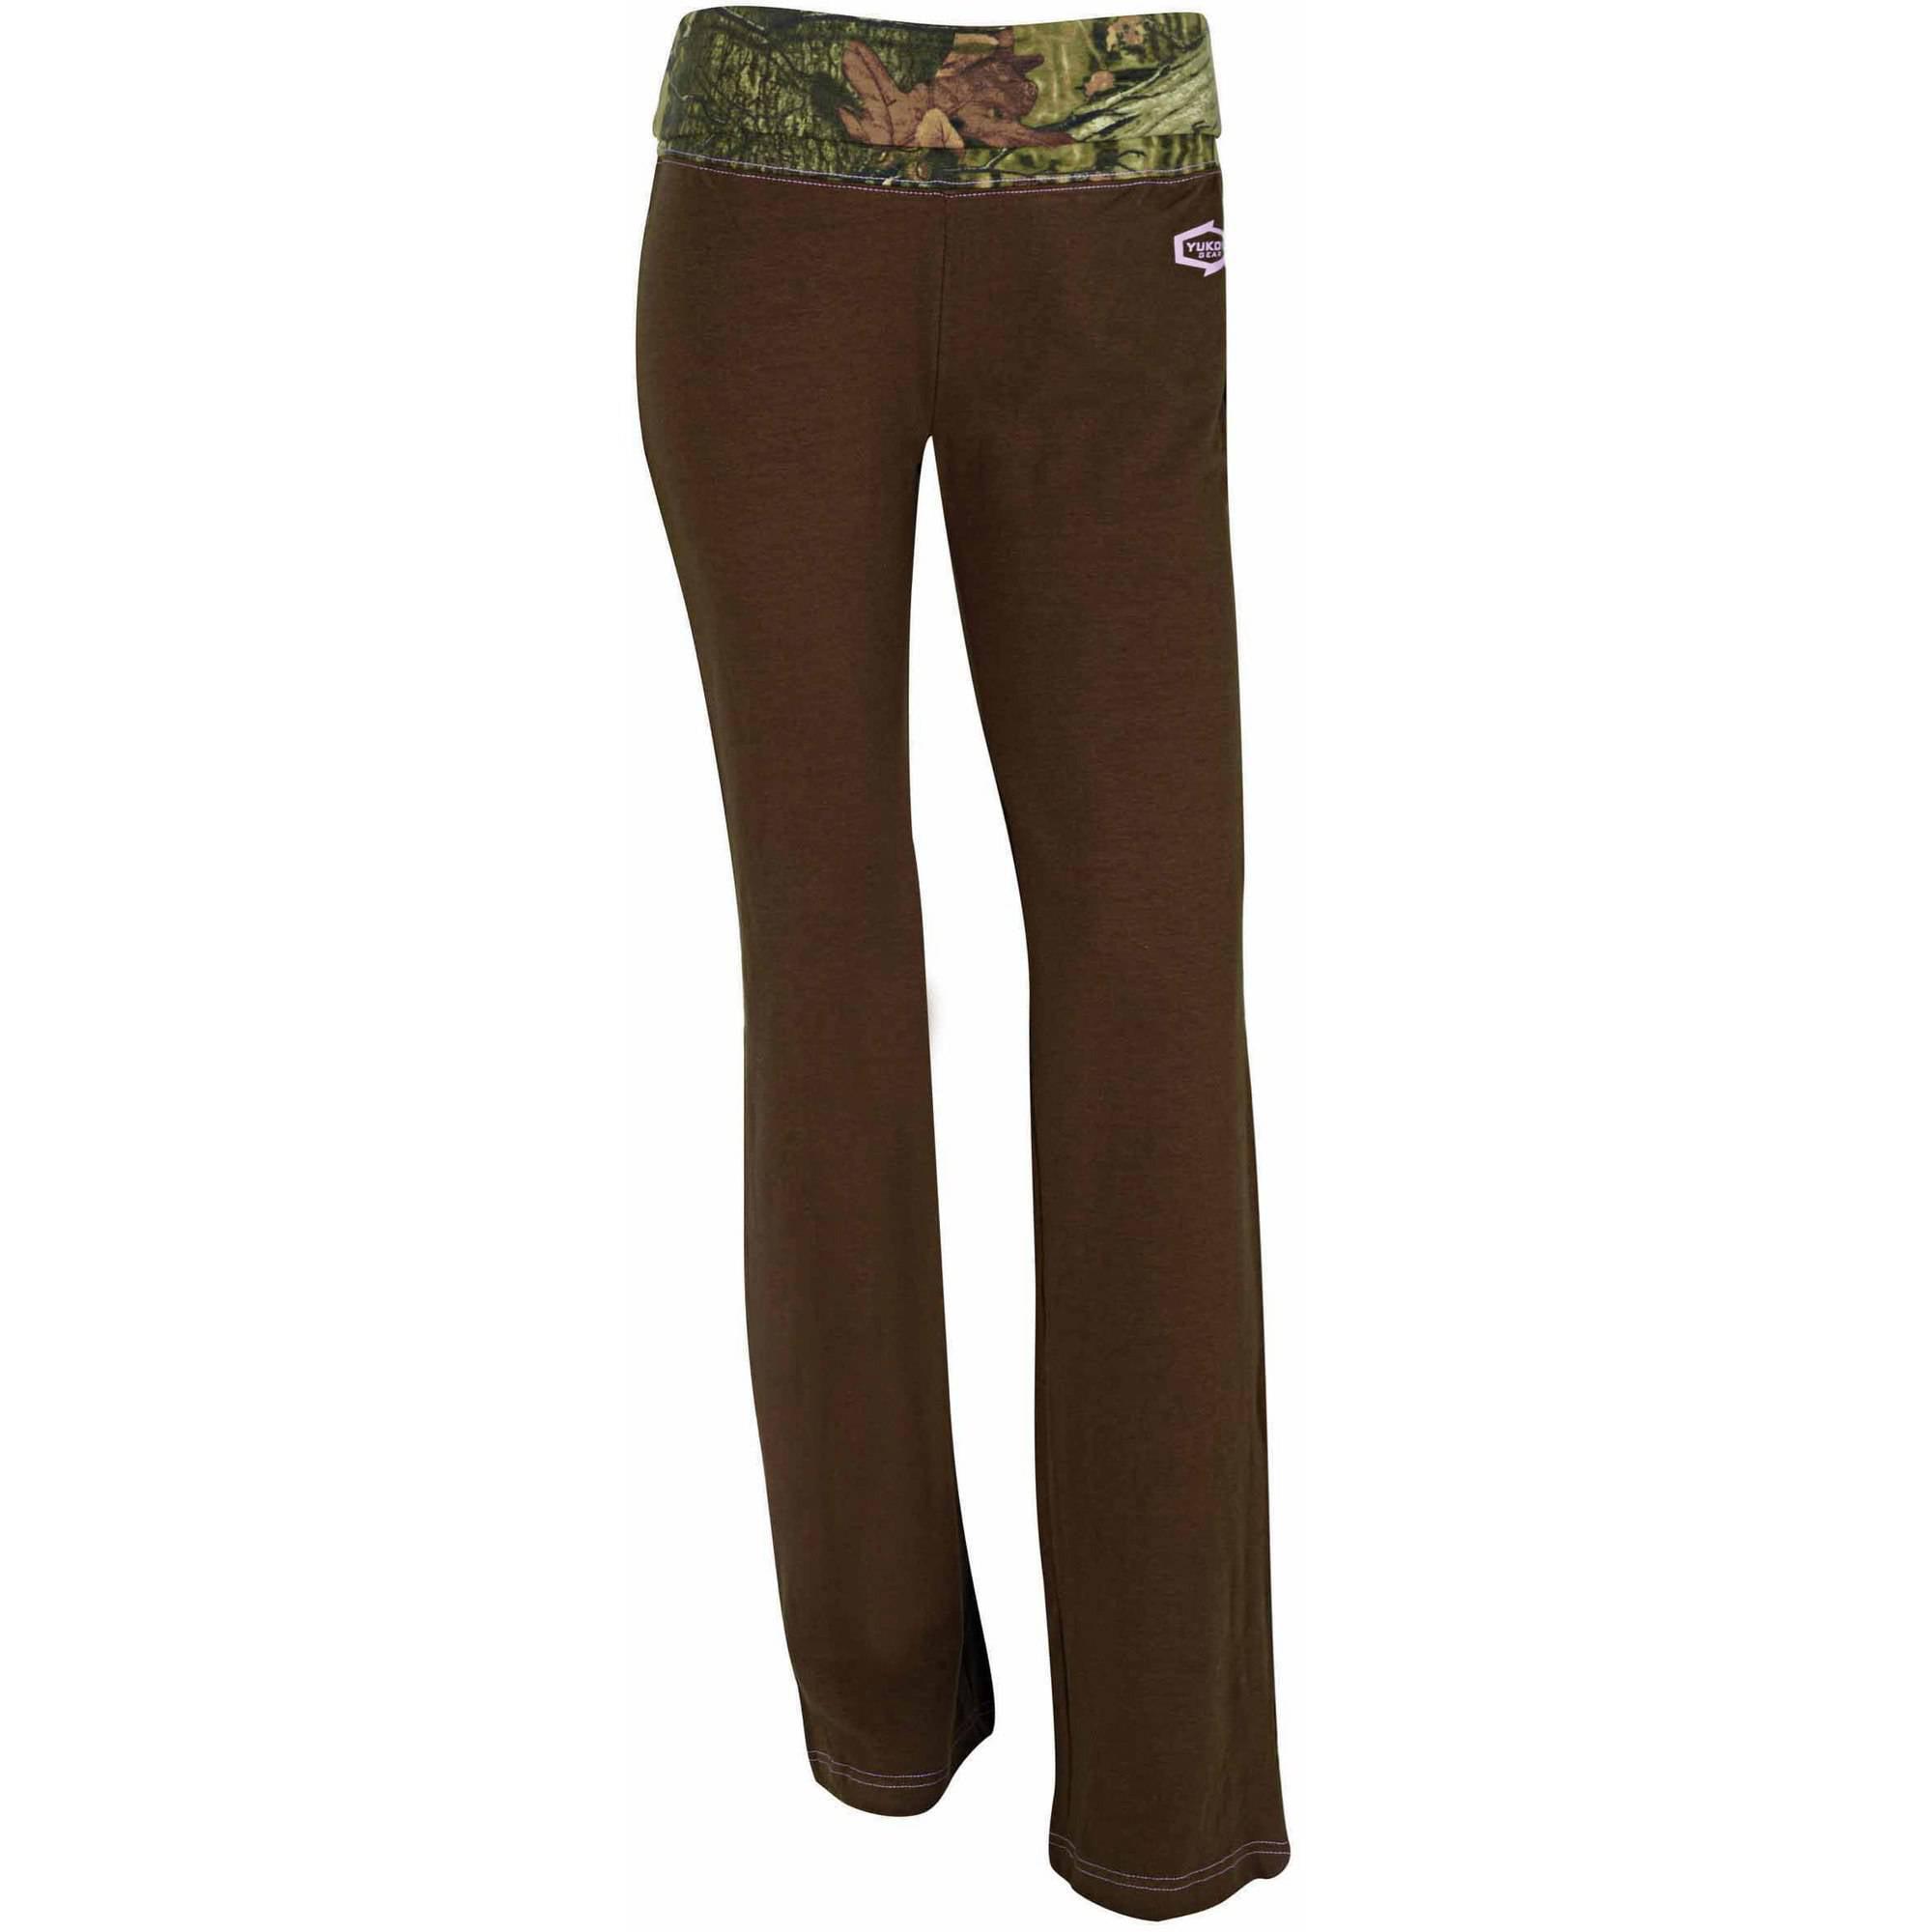 b0870544545c4 Camouflage Pants